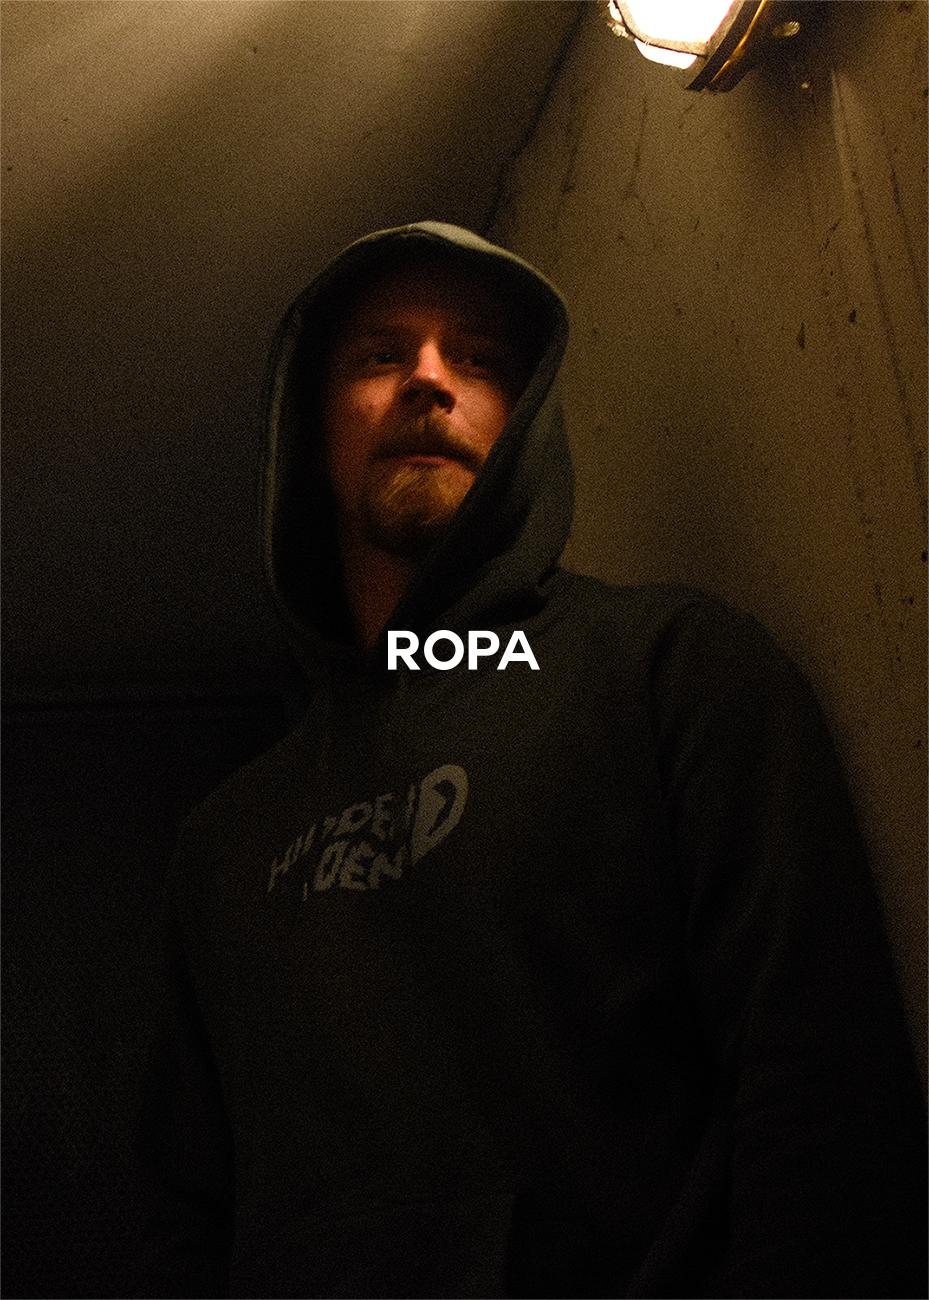 Hidden-den - ROPA